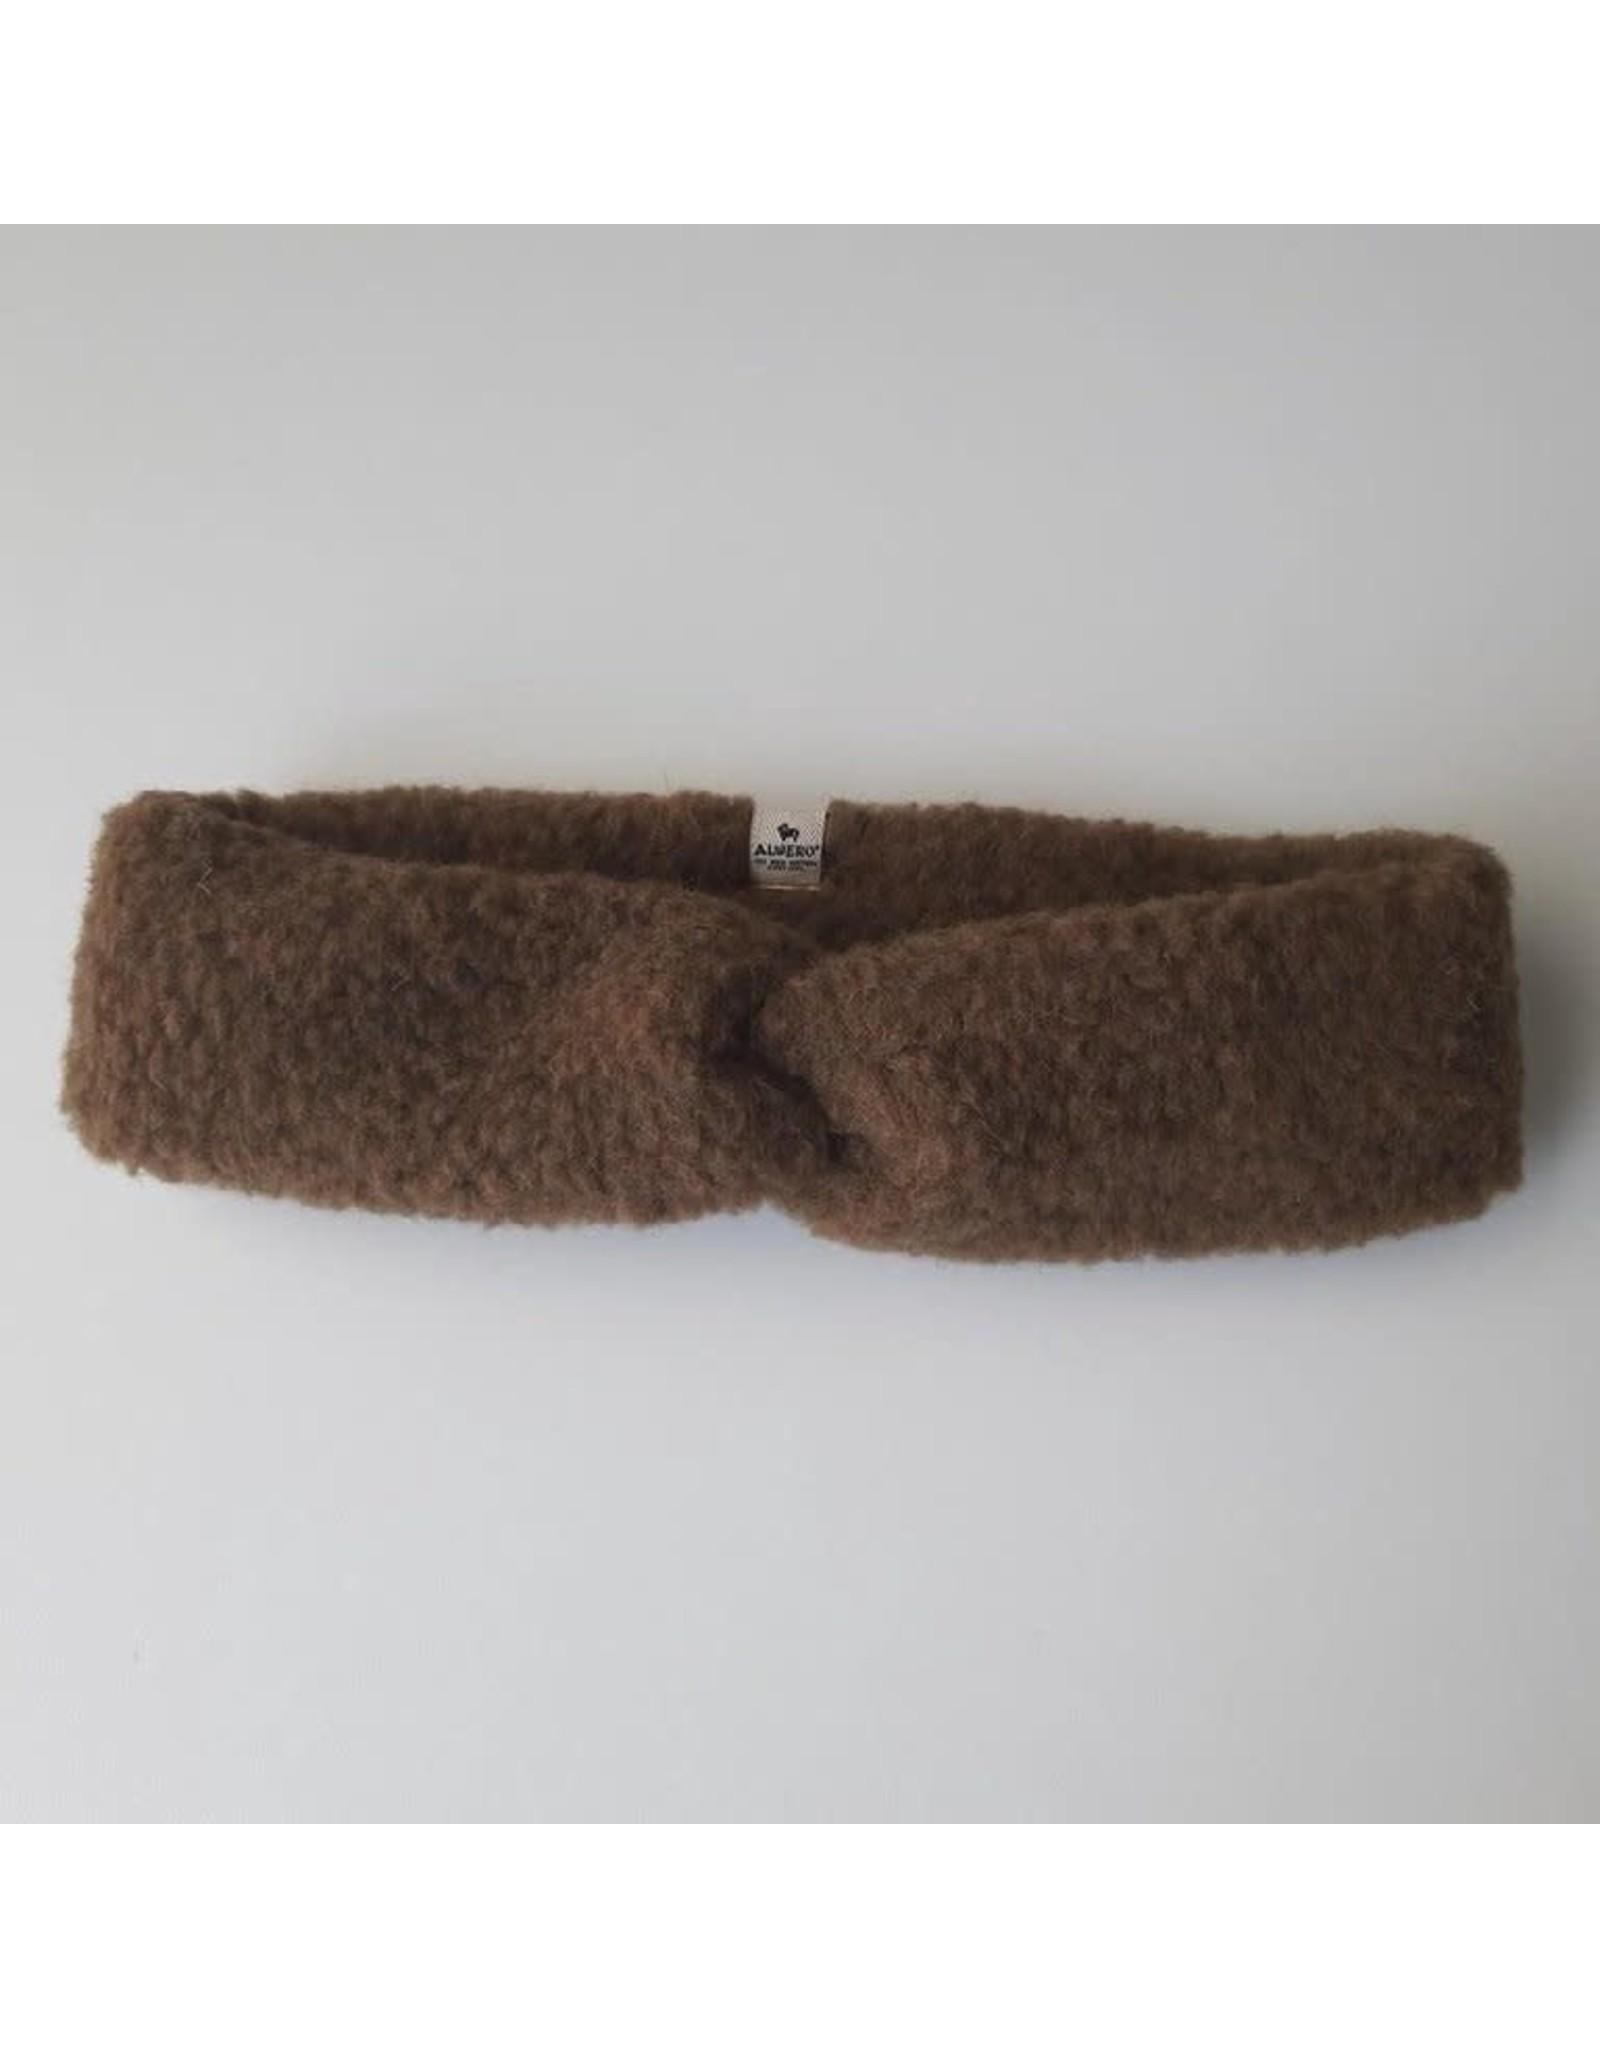 Alwero hoofdband 100% wol //bark